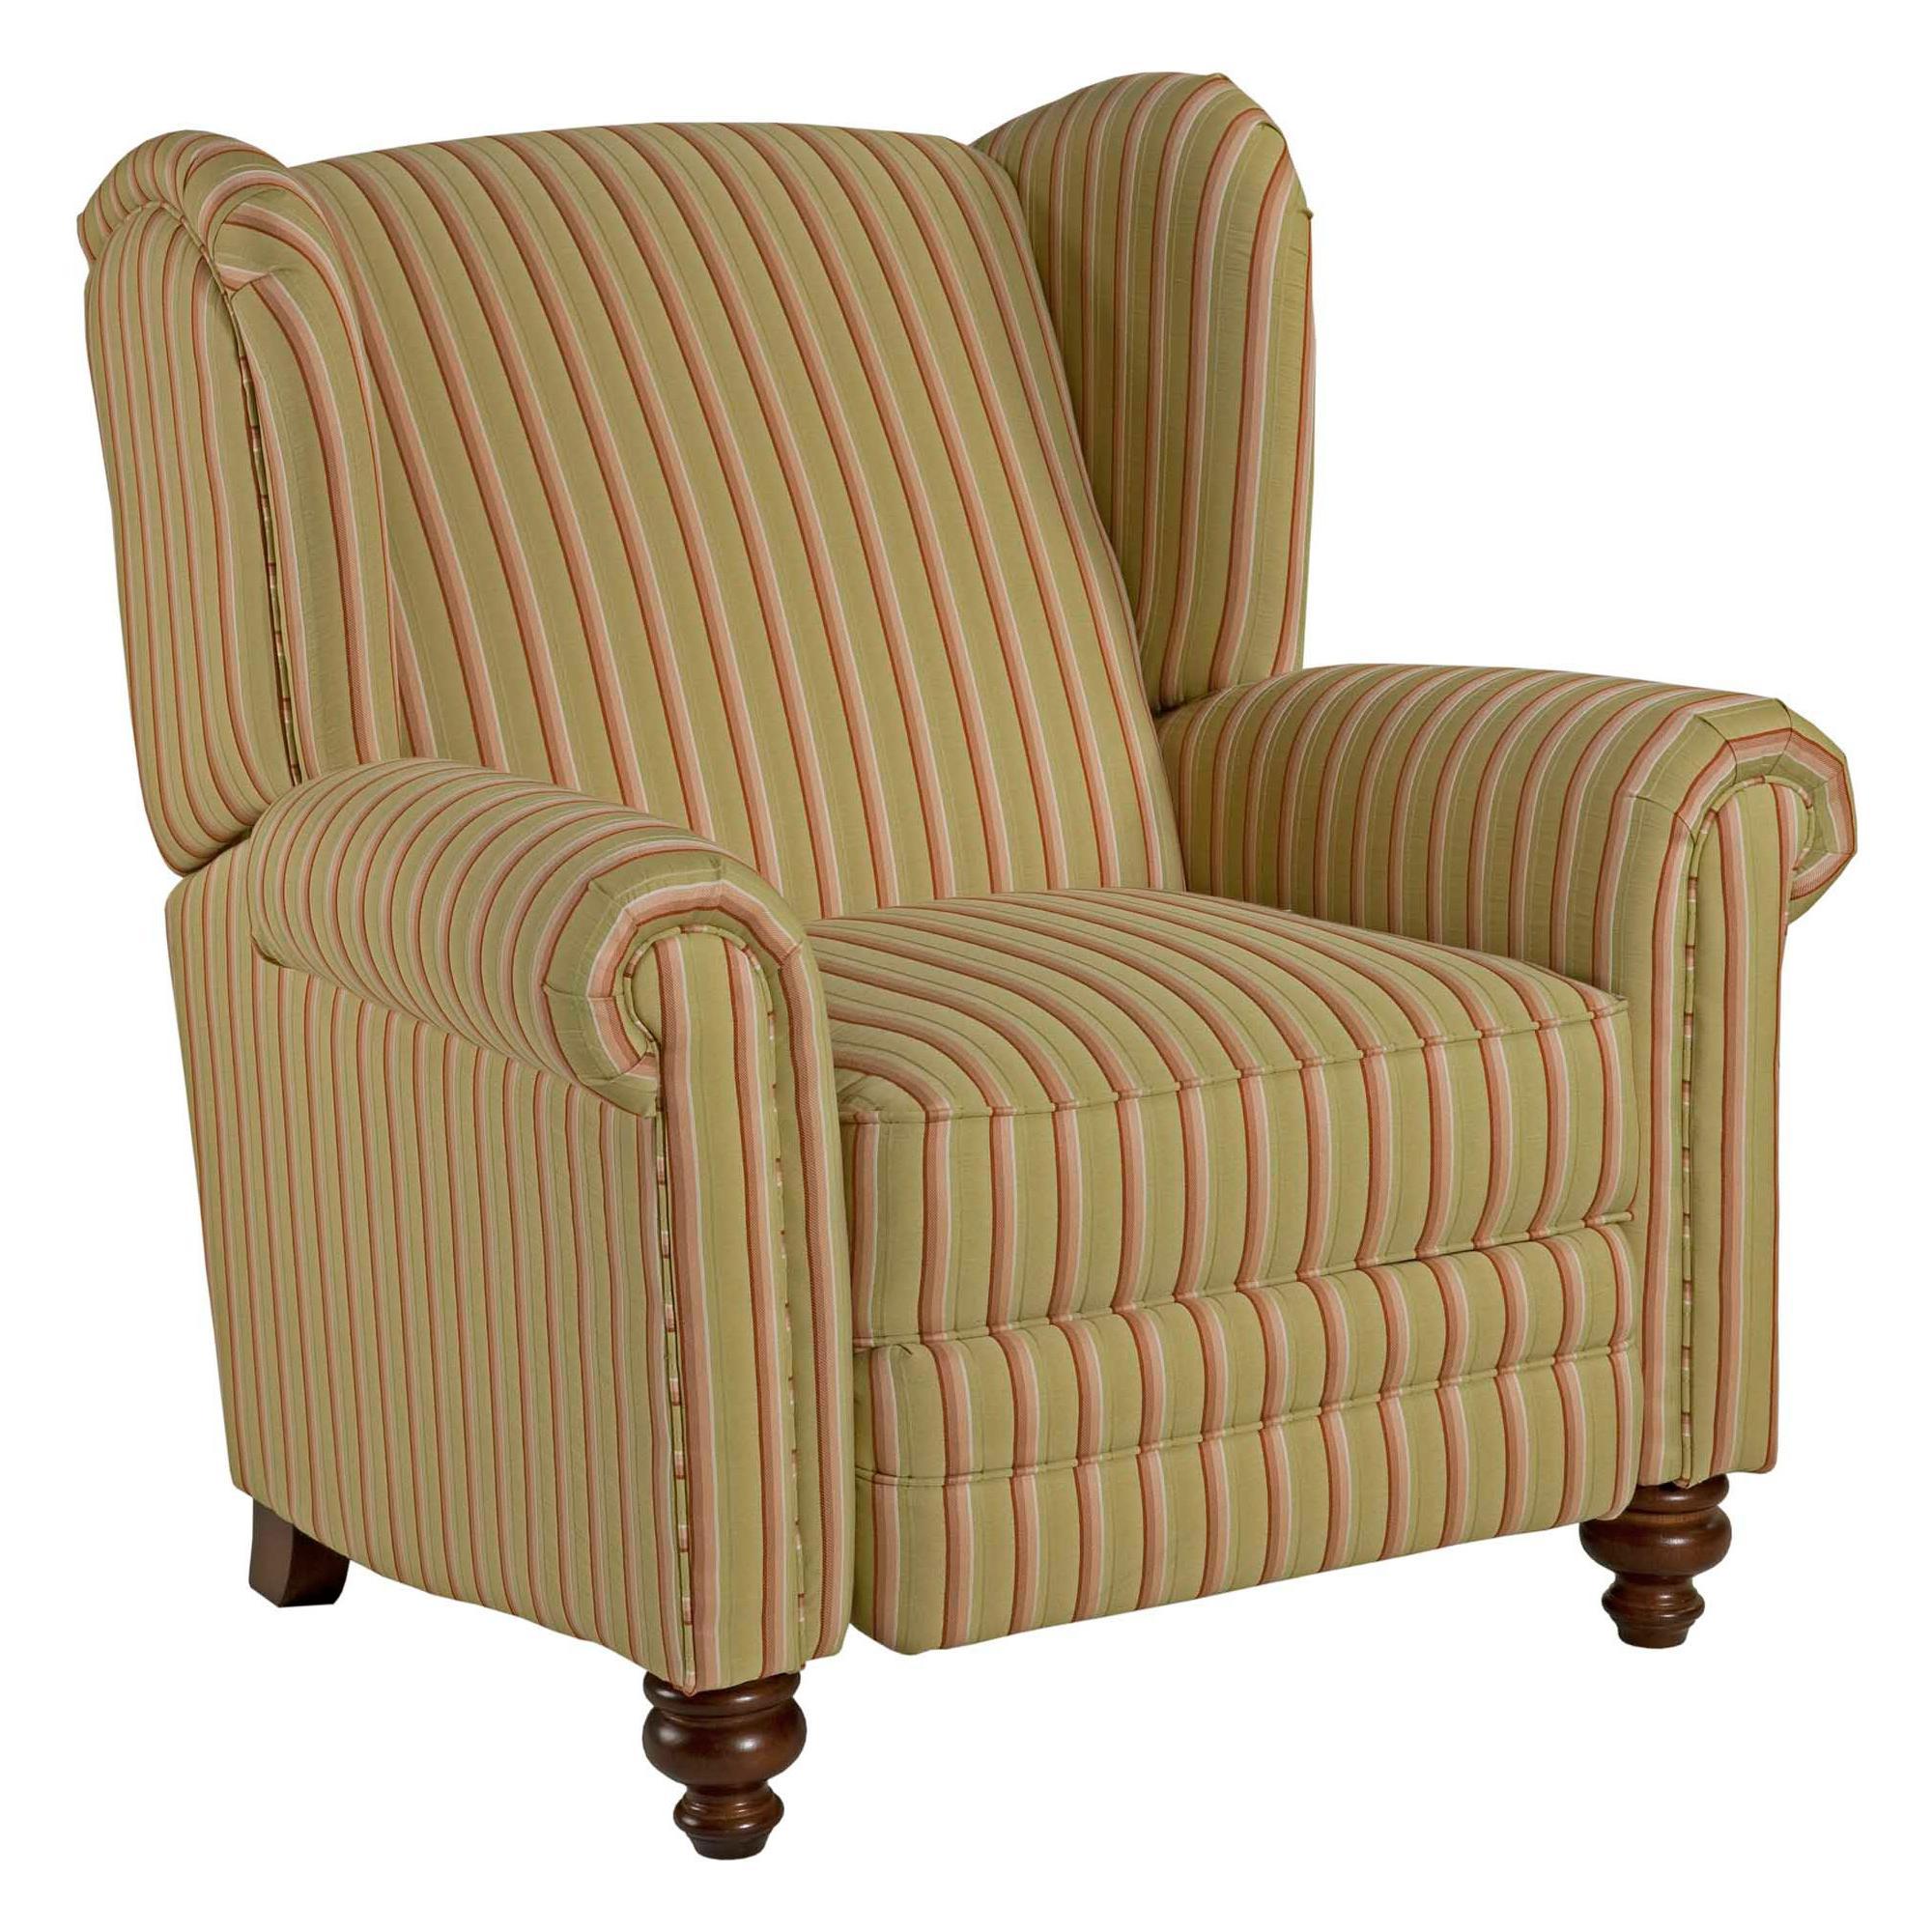 Marks And Spencer Hastings Bedroom Furniture Broyhill Furniture Corrine Low Profile Recliner Ahfa Three Way